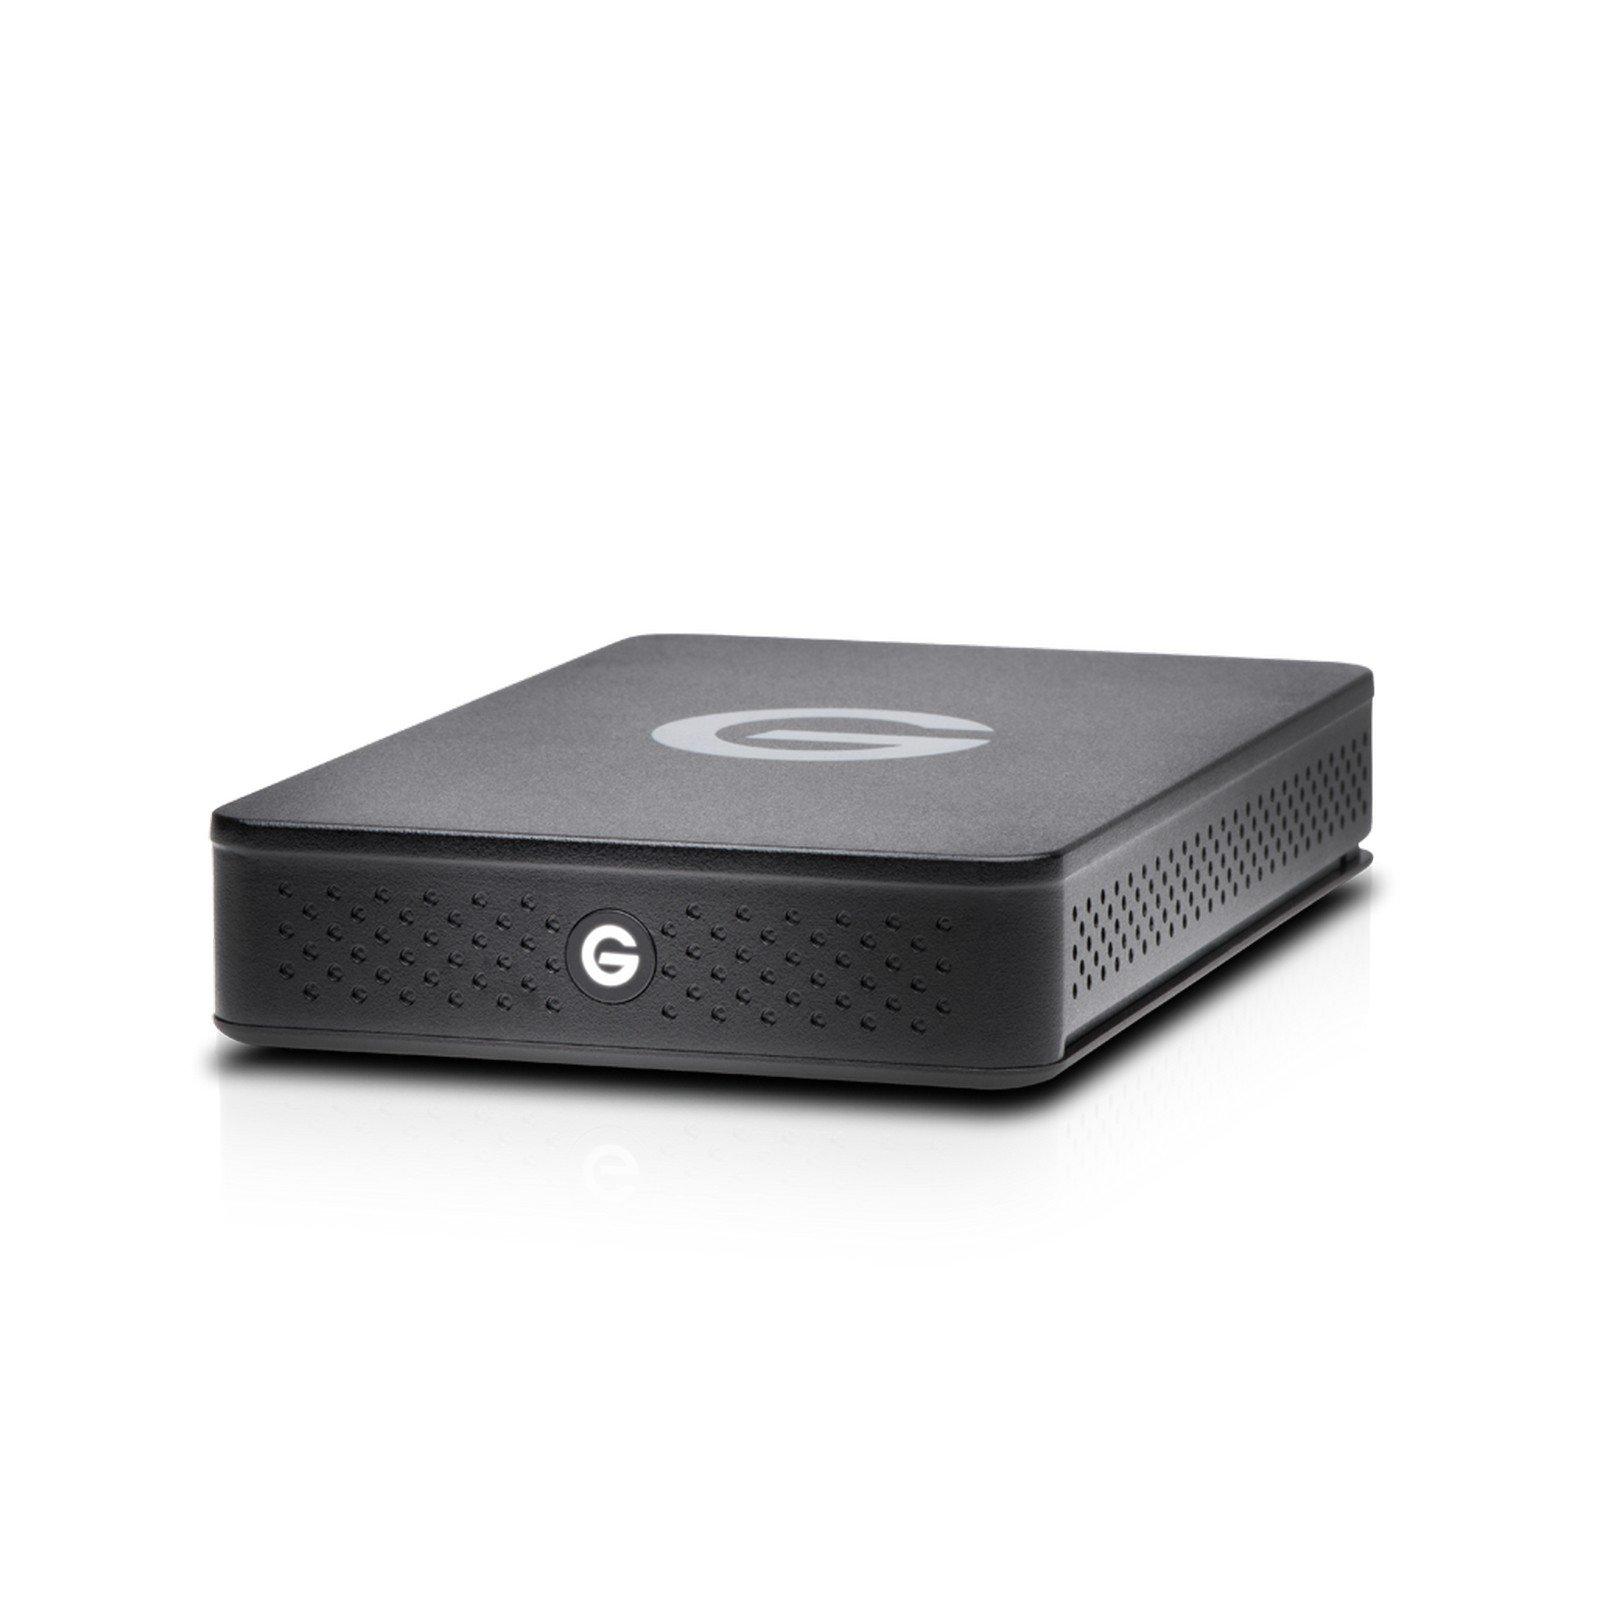 G-Technology G-DRIVE ev RaW USB 3.0 Portable Hard Drive 2TB 0G05190